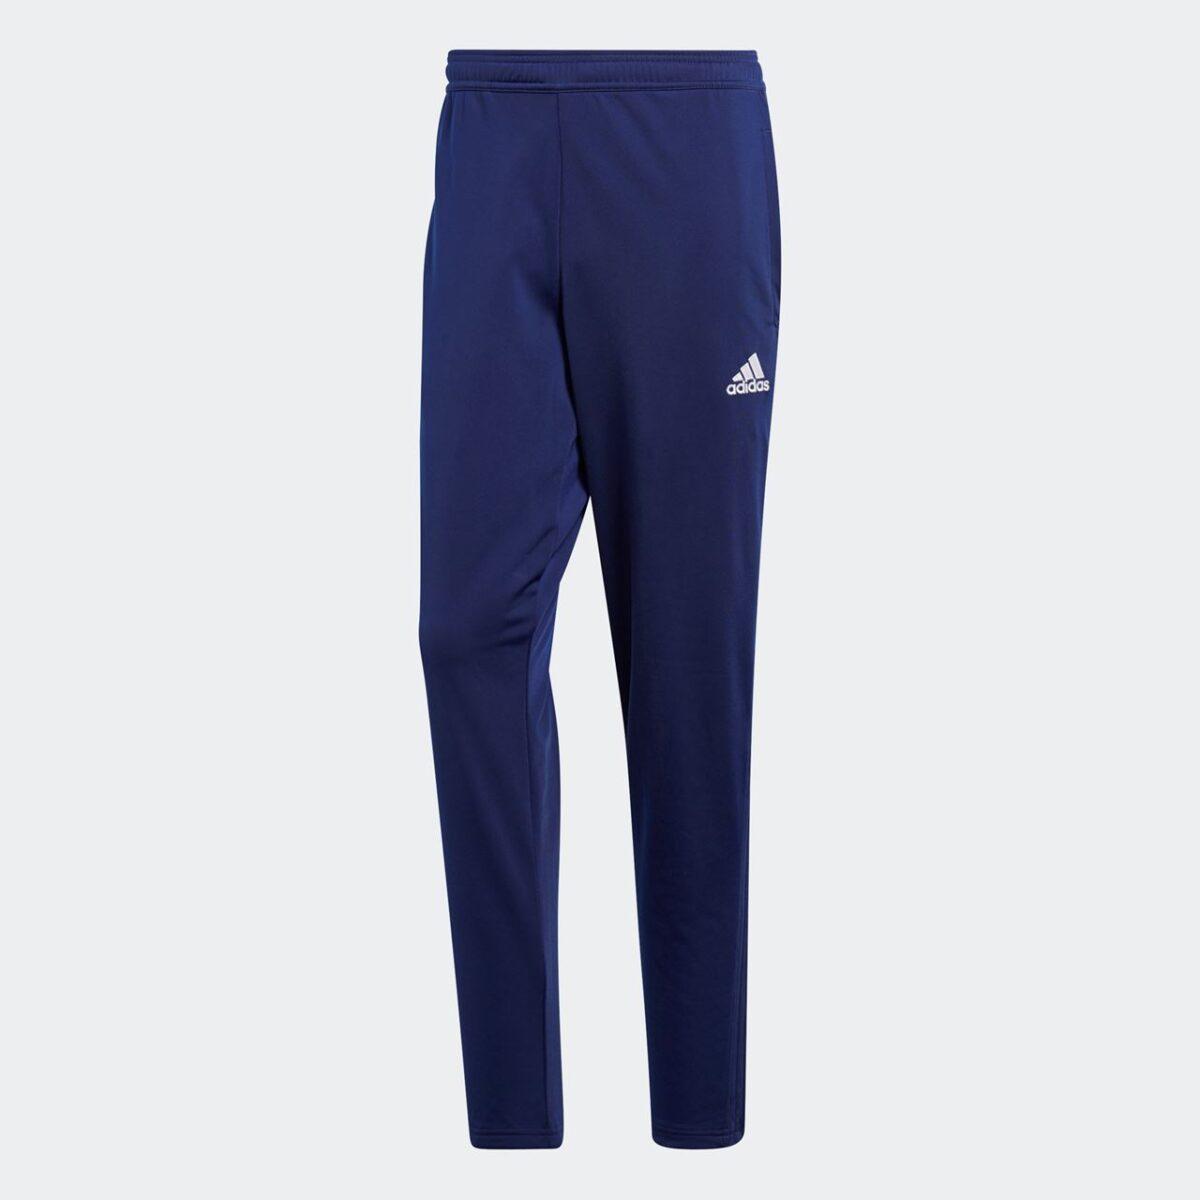 Adidas Condivo 18 PES Pant Adult